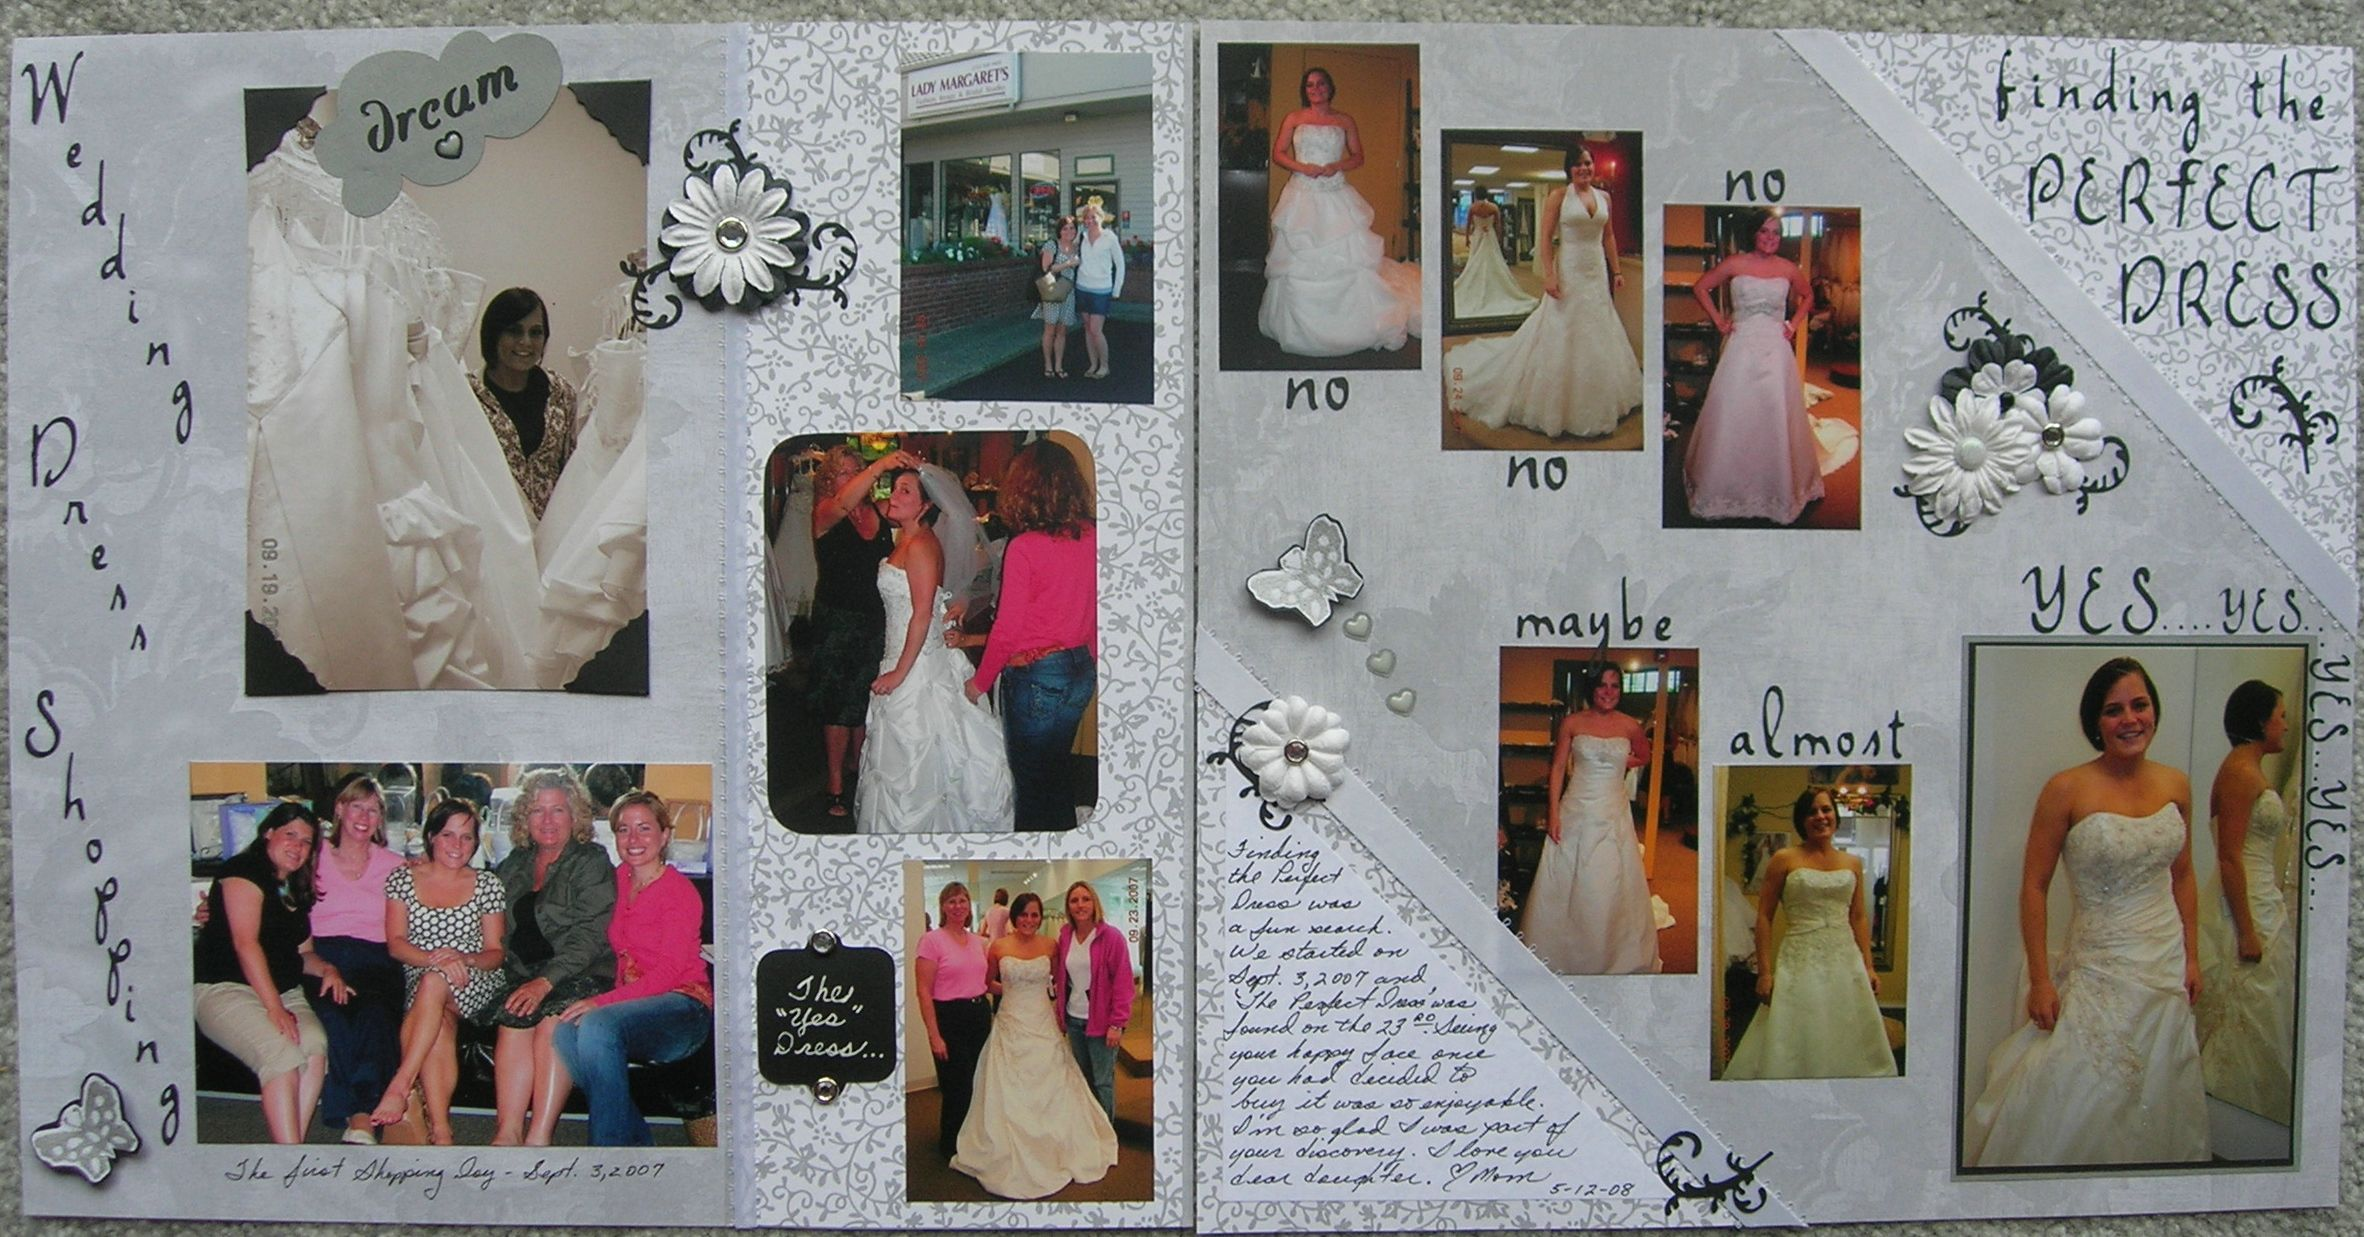 Wedding Dress Shopping Laouts Scrapbook Com Wedding Scrapbook Pages Wedding Scrapbooking Layouts Wedding Dress Shopping